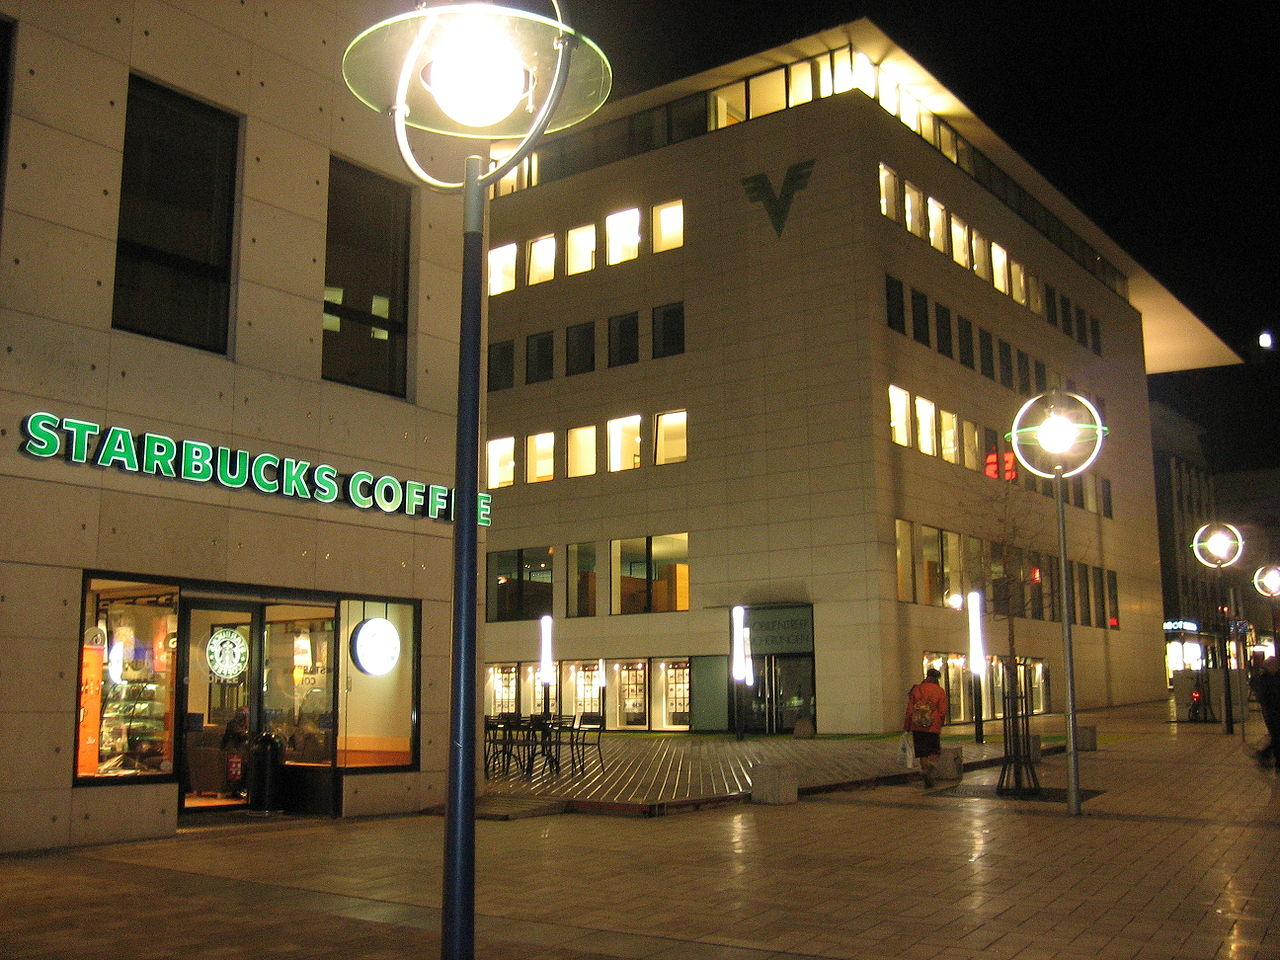 Starbucks Coffee in Dortmund by Sven2512 Wikimedia Commons